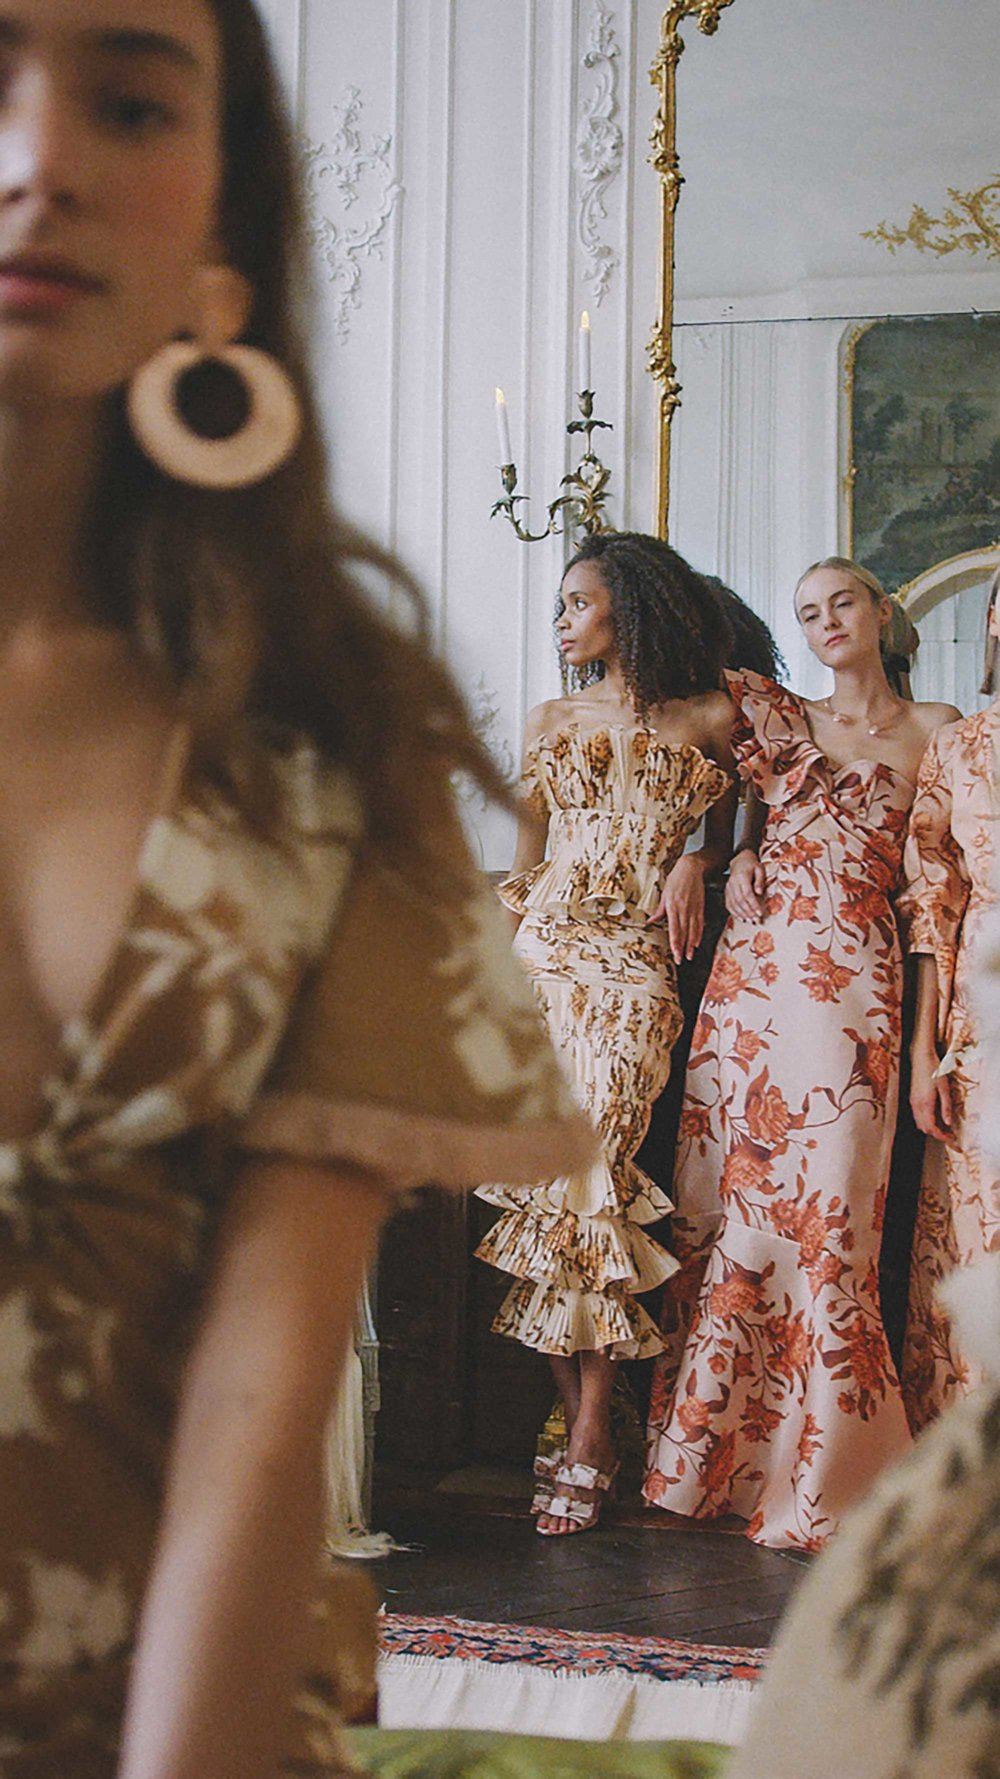 Johanna Ortiz Spring Summer 2019 Presentation Paris Fashion Week3.jpg